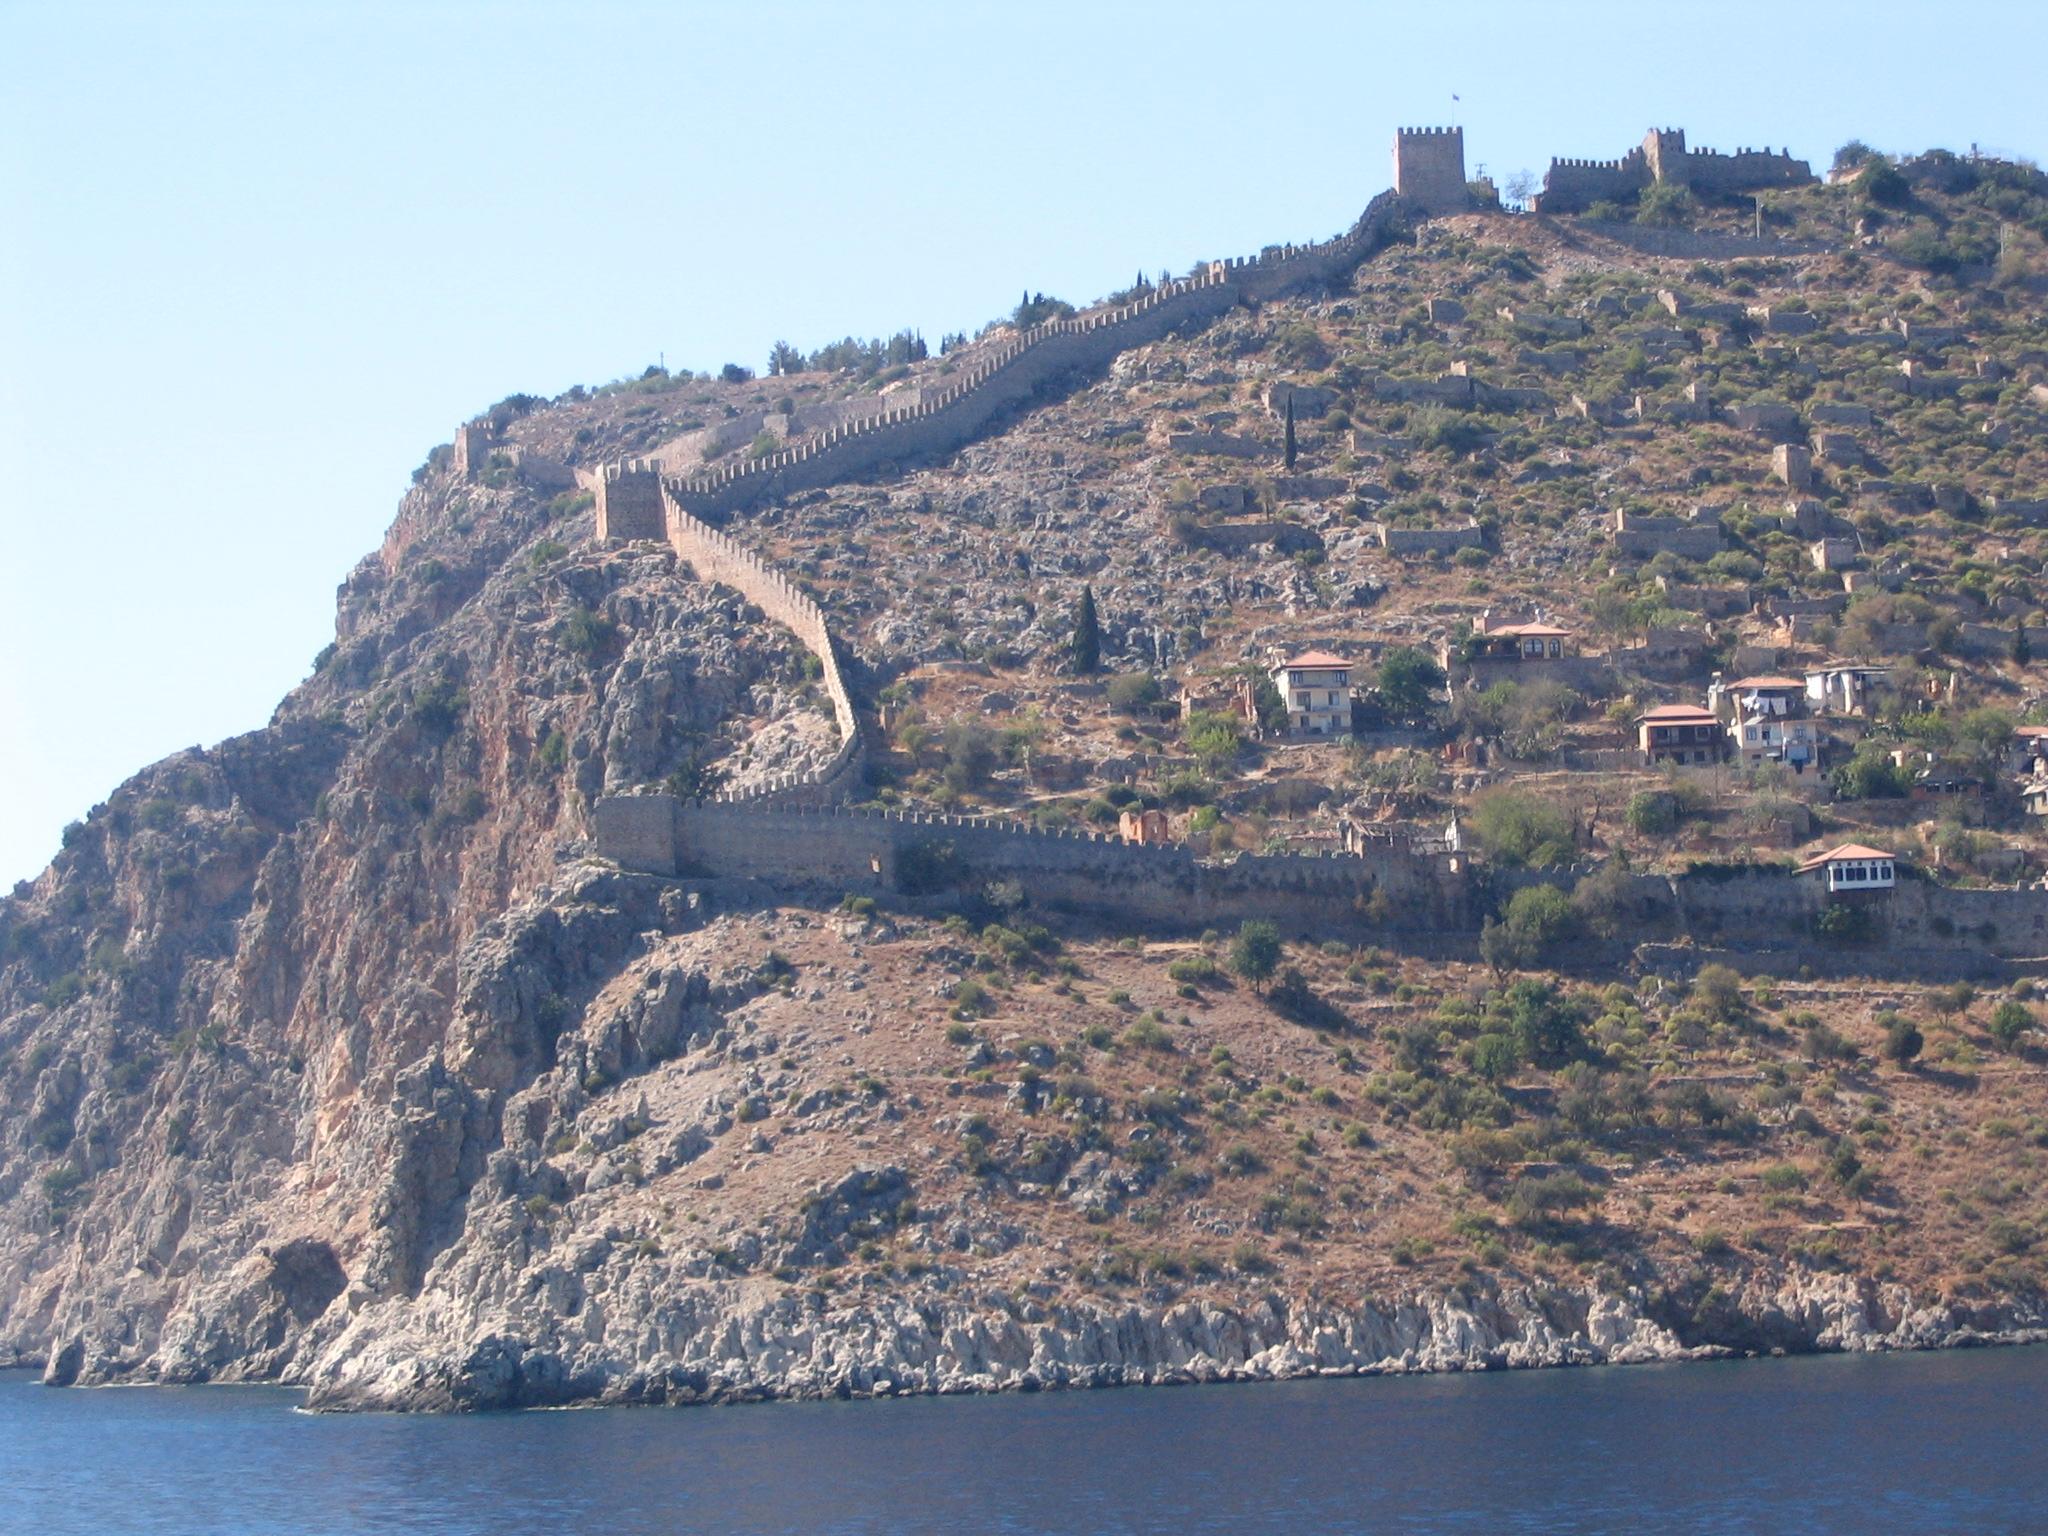 File:Alanya wall.jpg - Wikimedia Commons